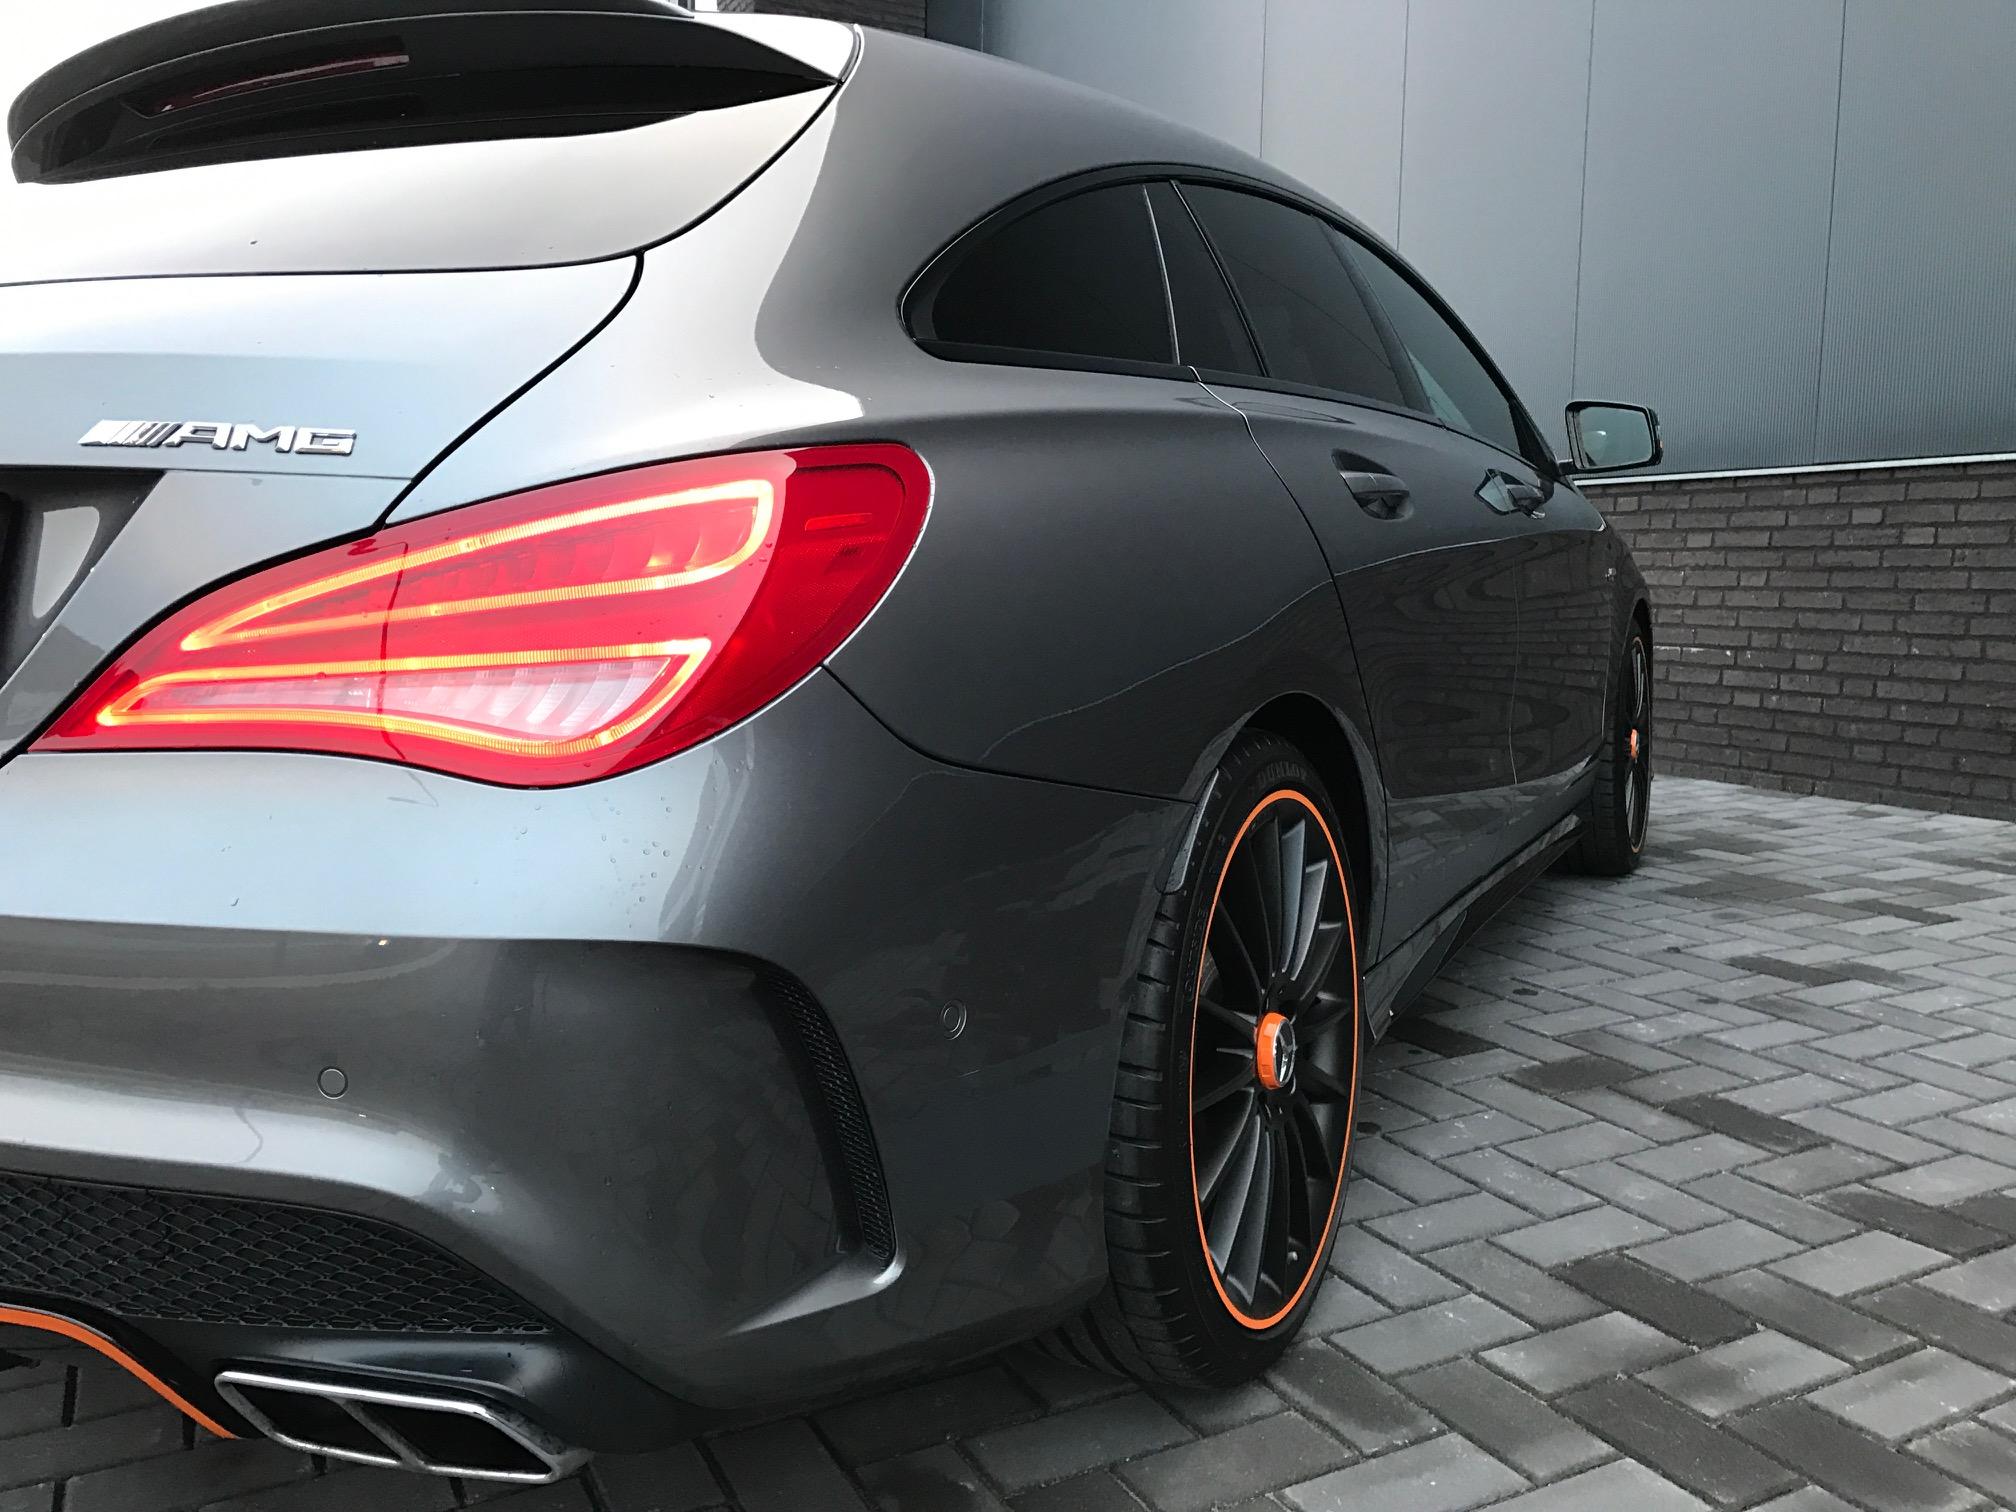 Cla 45 Amg >> Mercedes CLA AMG 45 SB – Car Fantasy Auto Verkoop